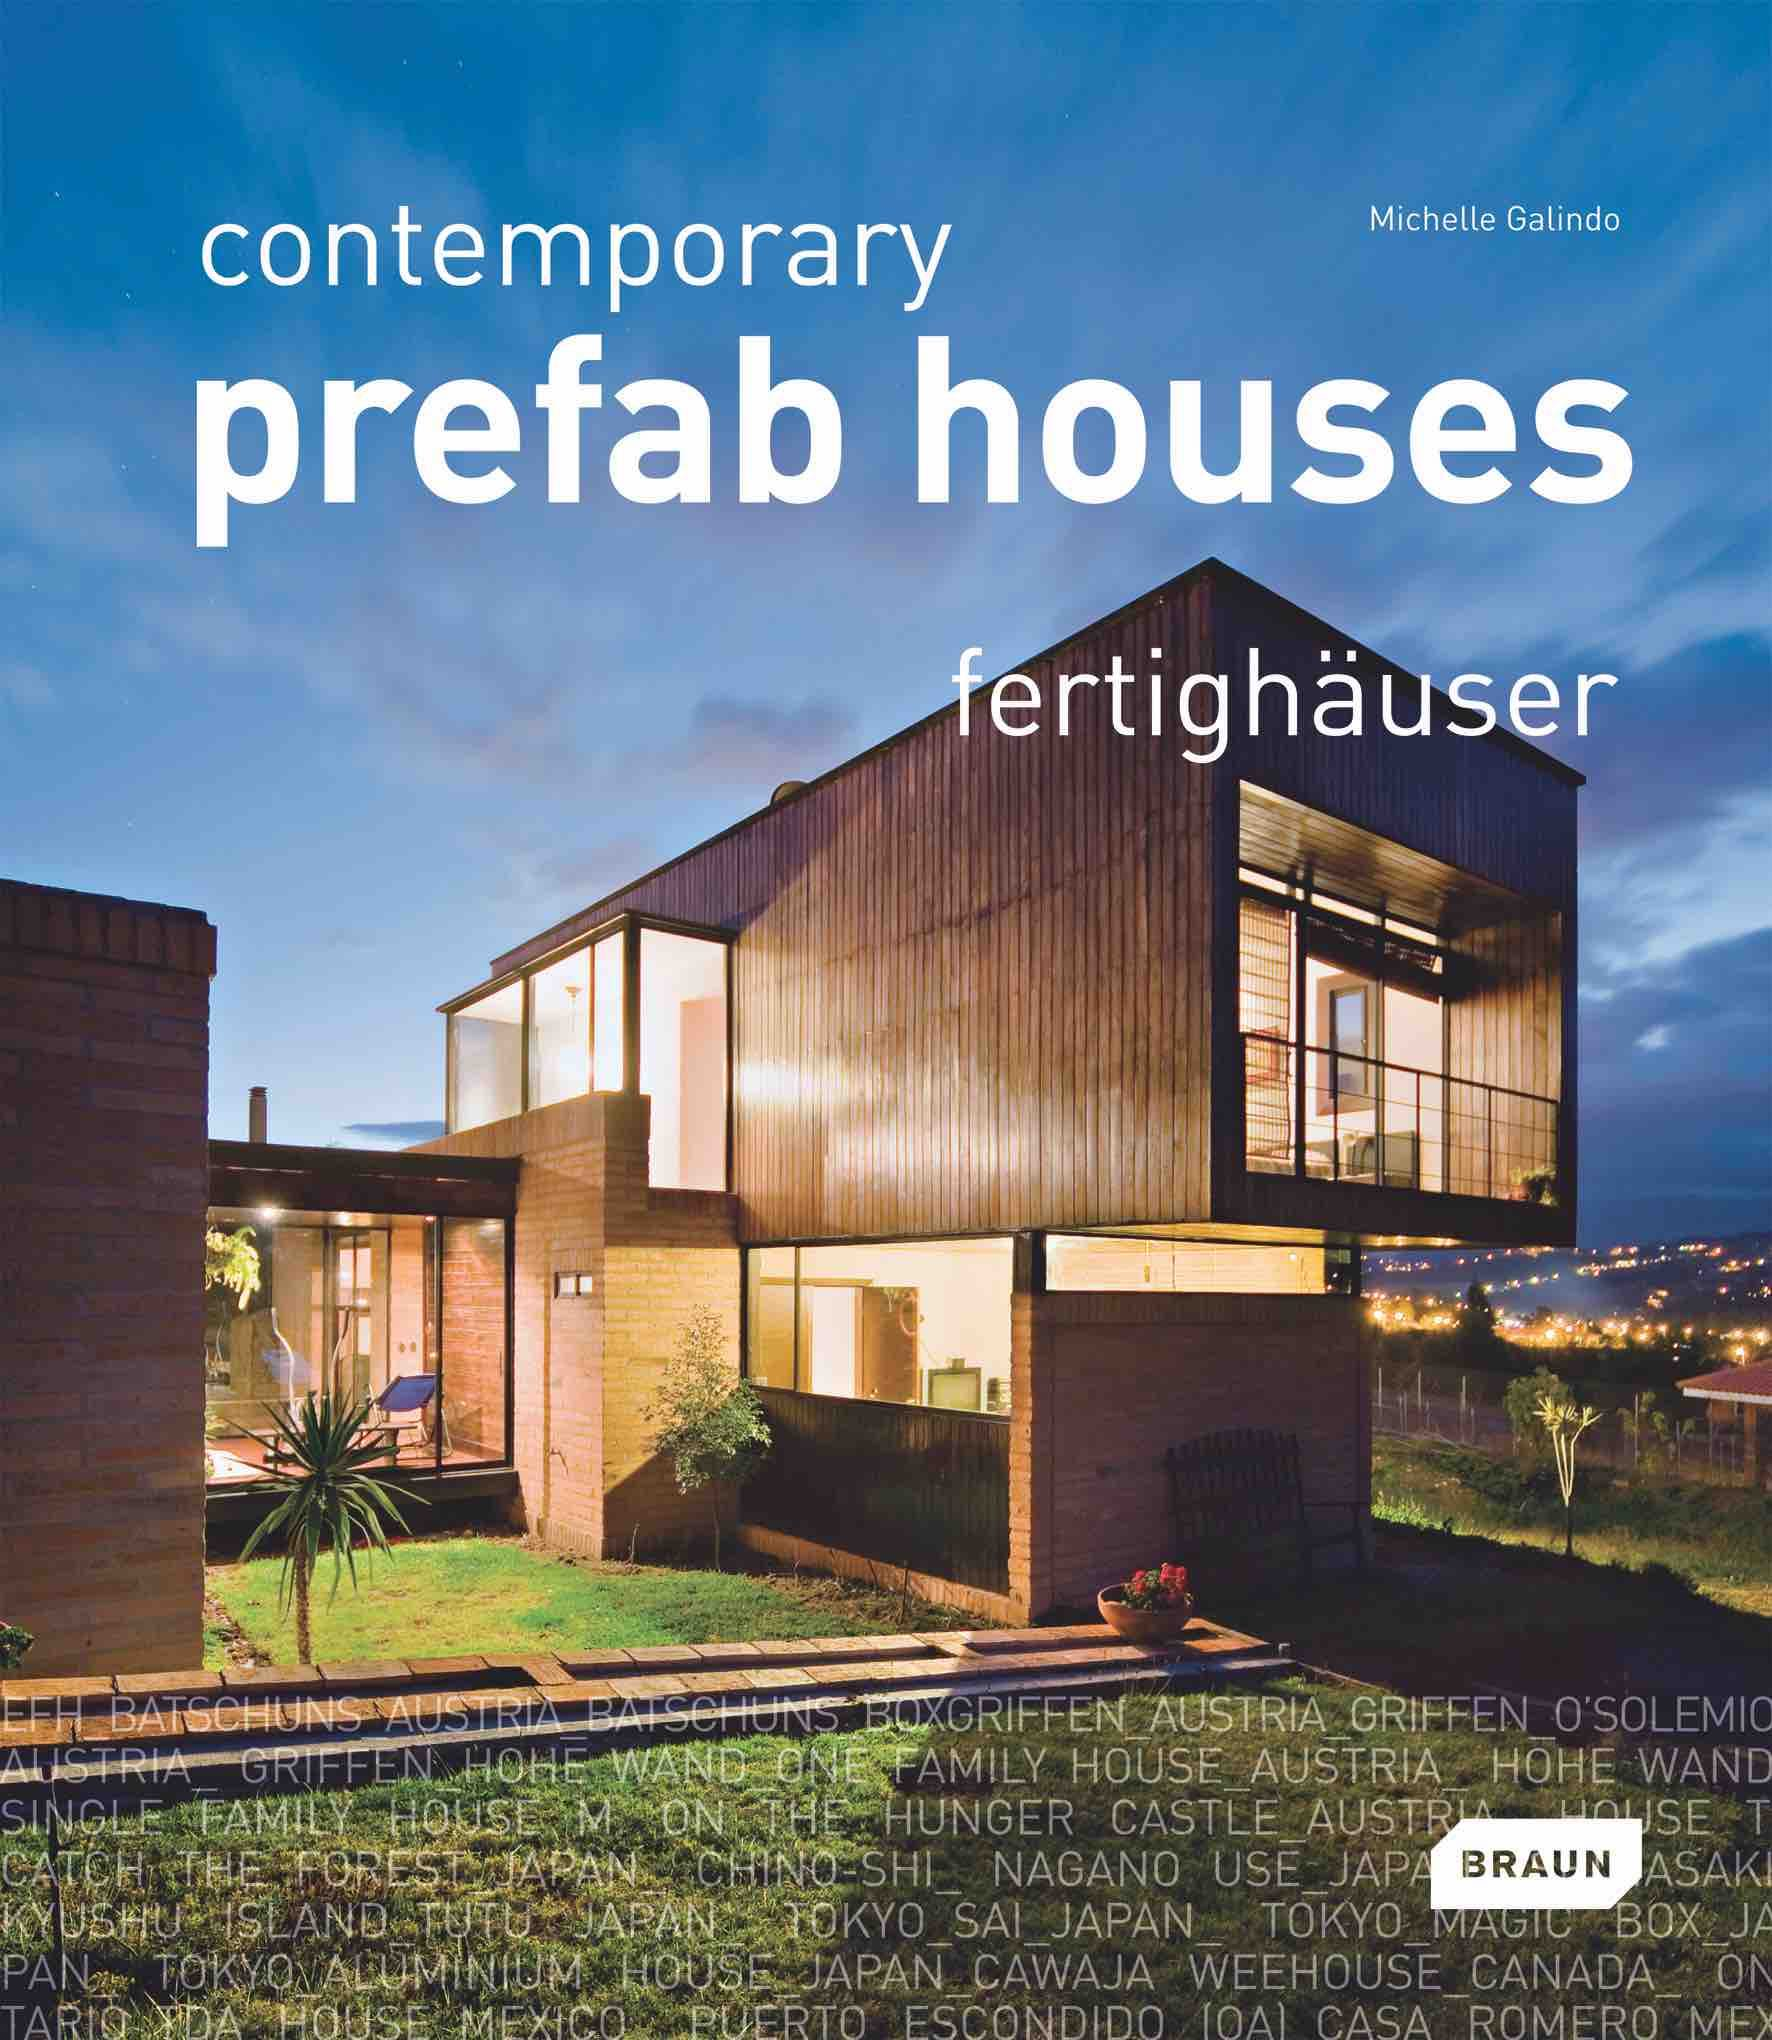 M. Galindo, Contemporary Prefab Houses, Braun Publishing AG, Switzerland, 2010, pp. 132-135